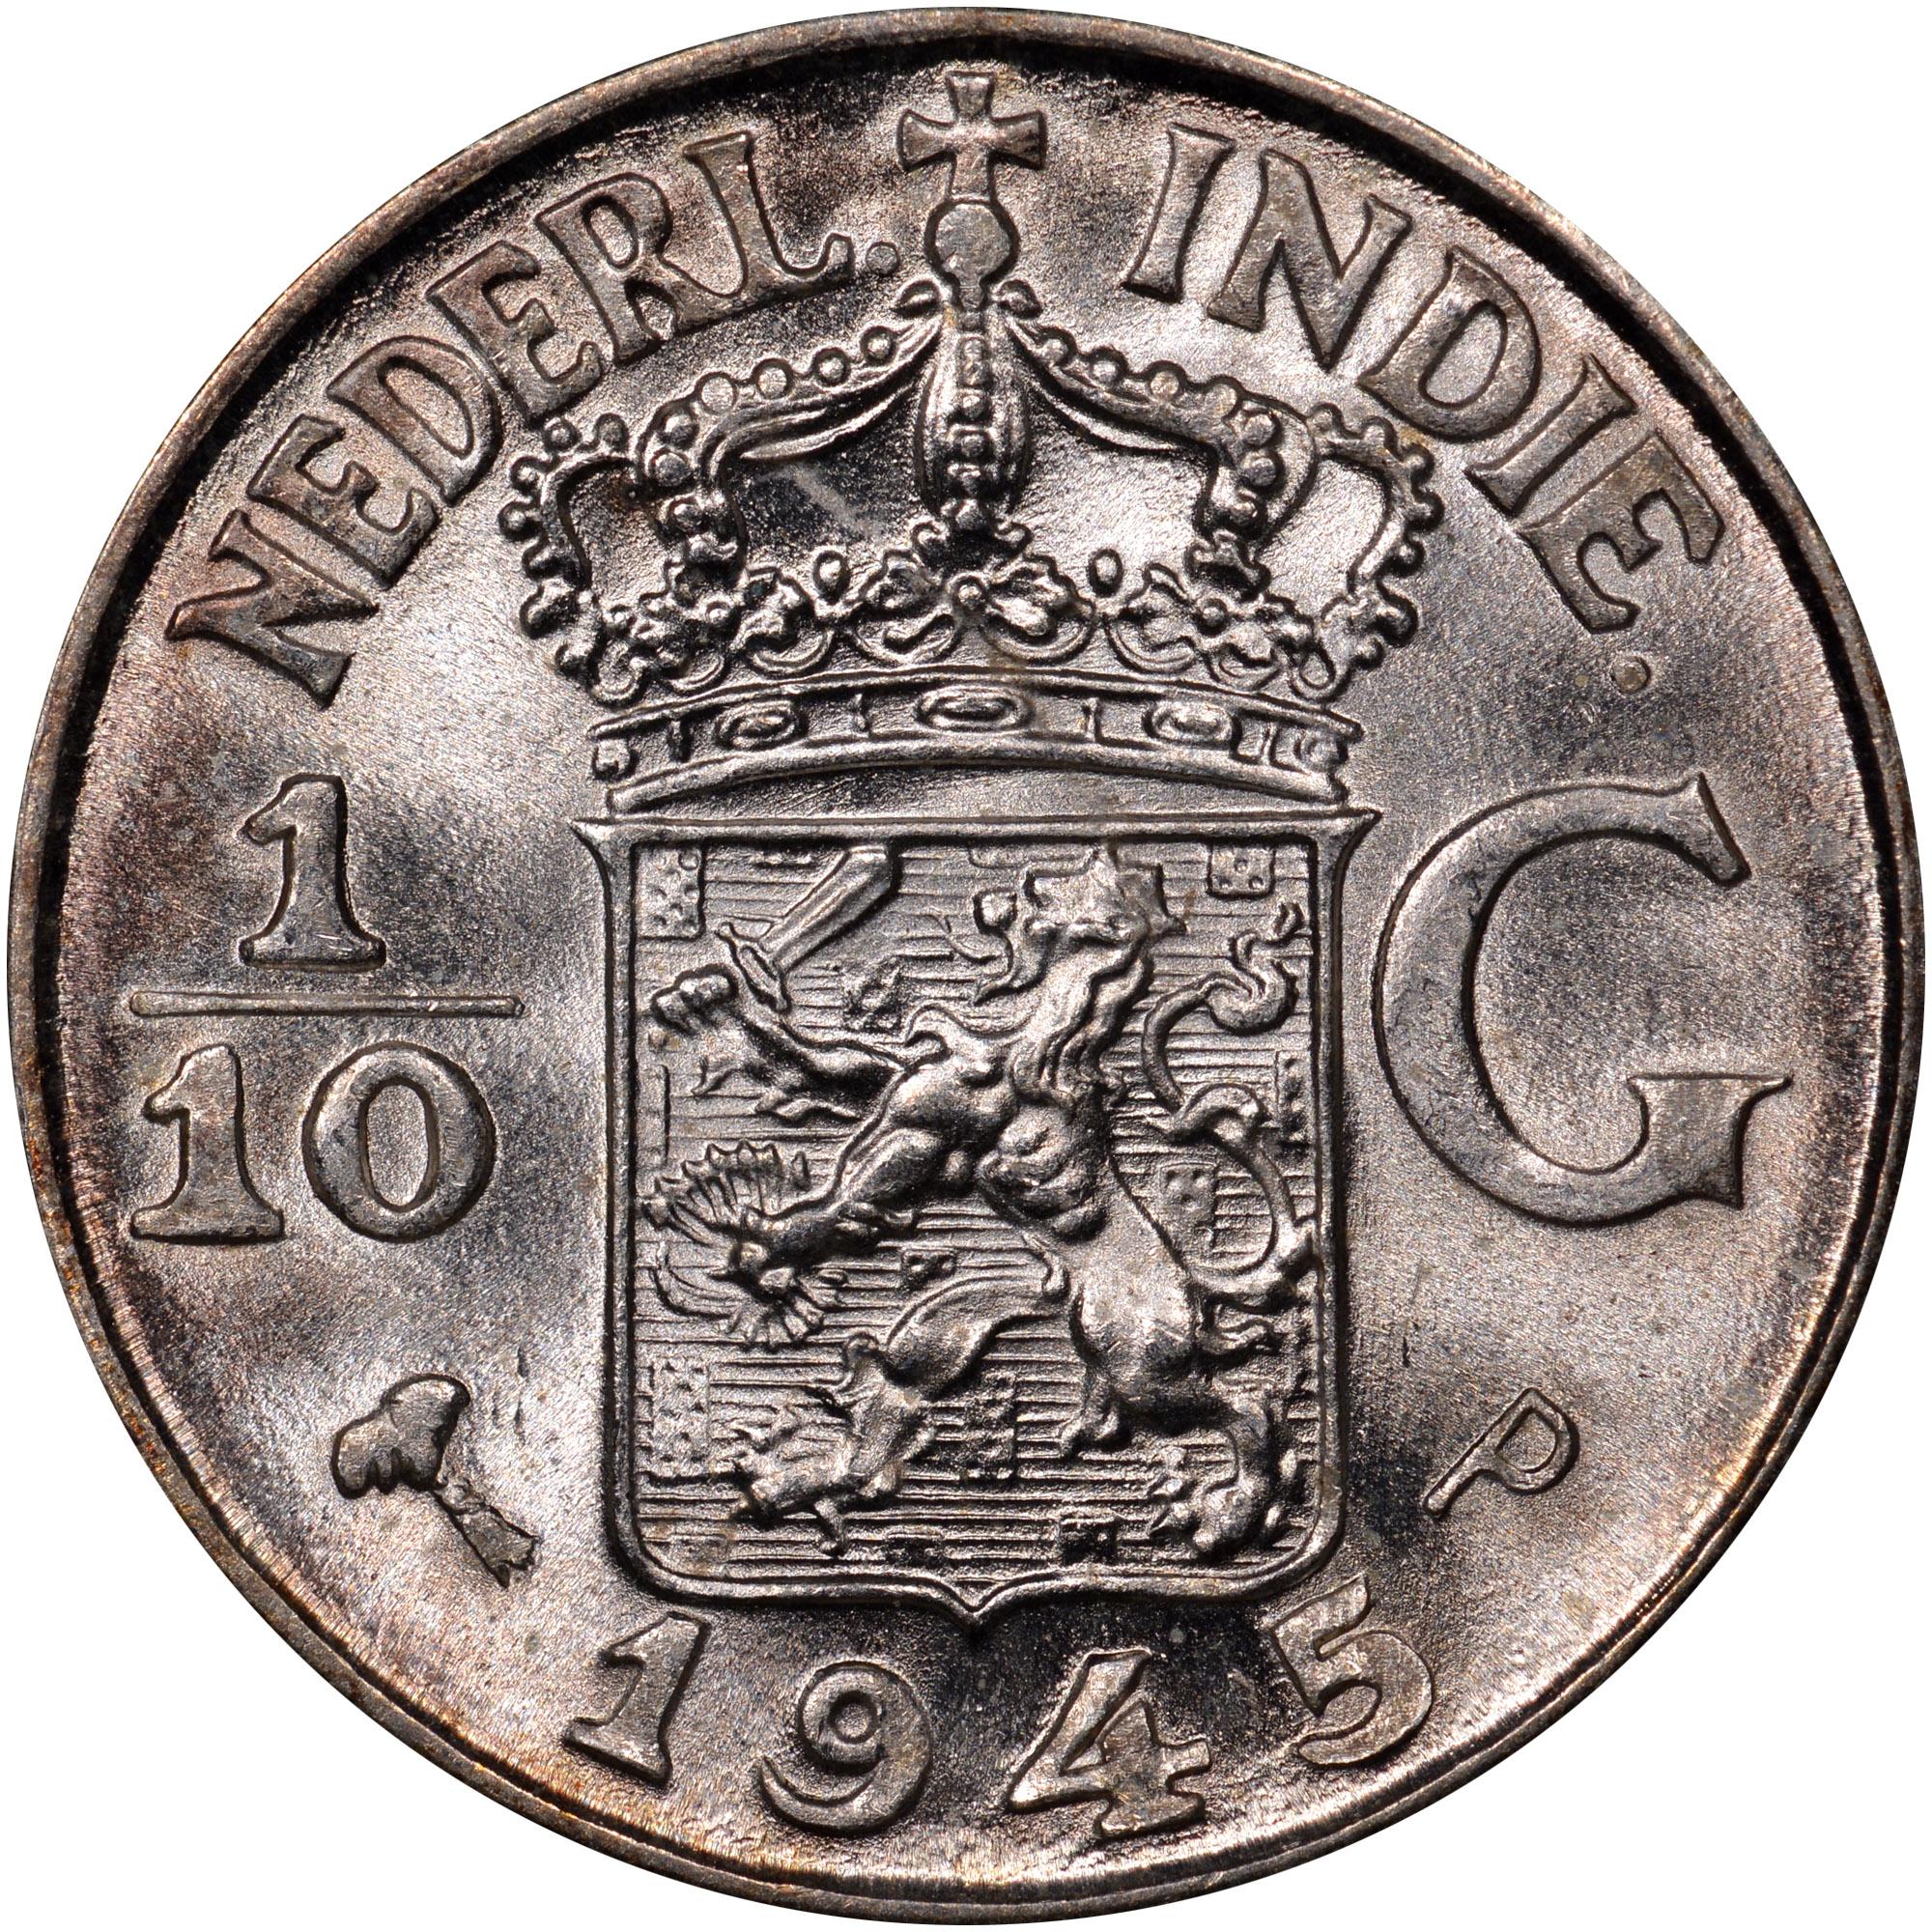 1937 1945 netherlands east indies 1 10 gulden km 318 for 1945 dutch east indies cuisine